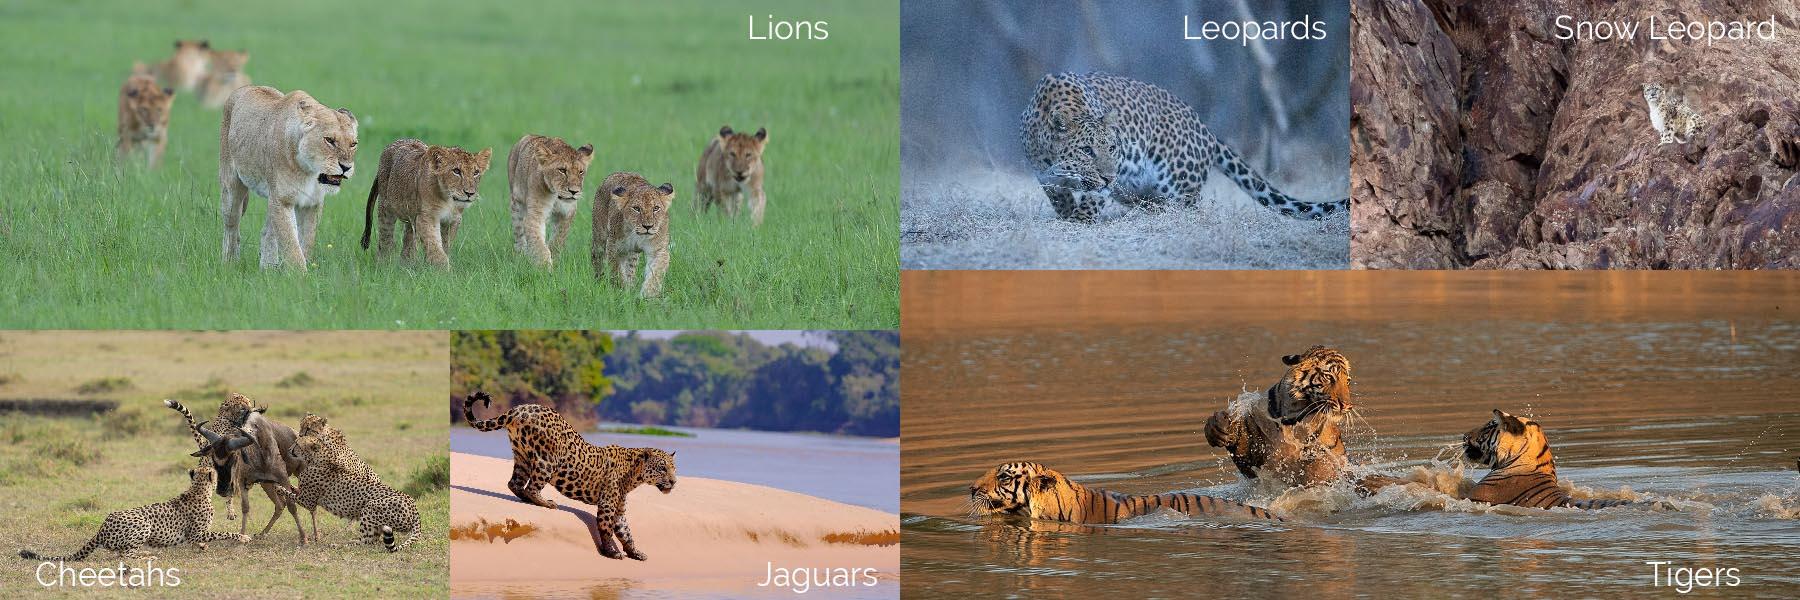 Big cat safaris around the world